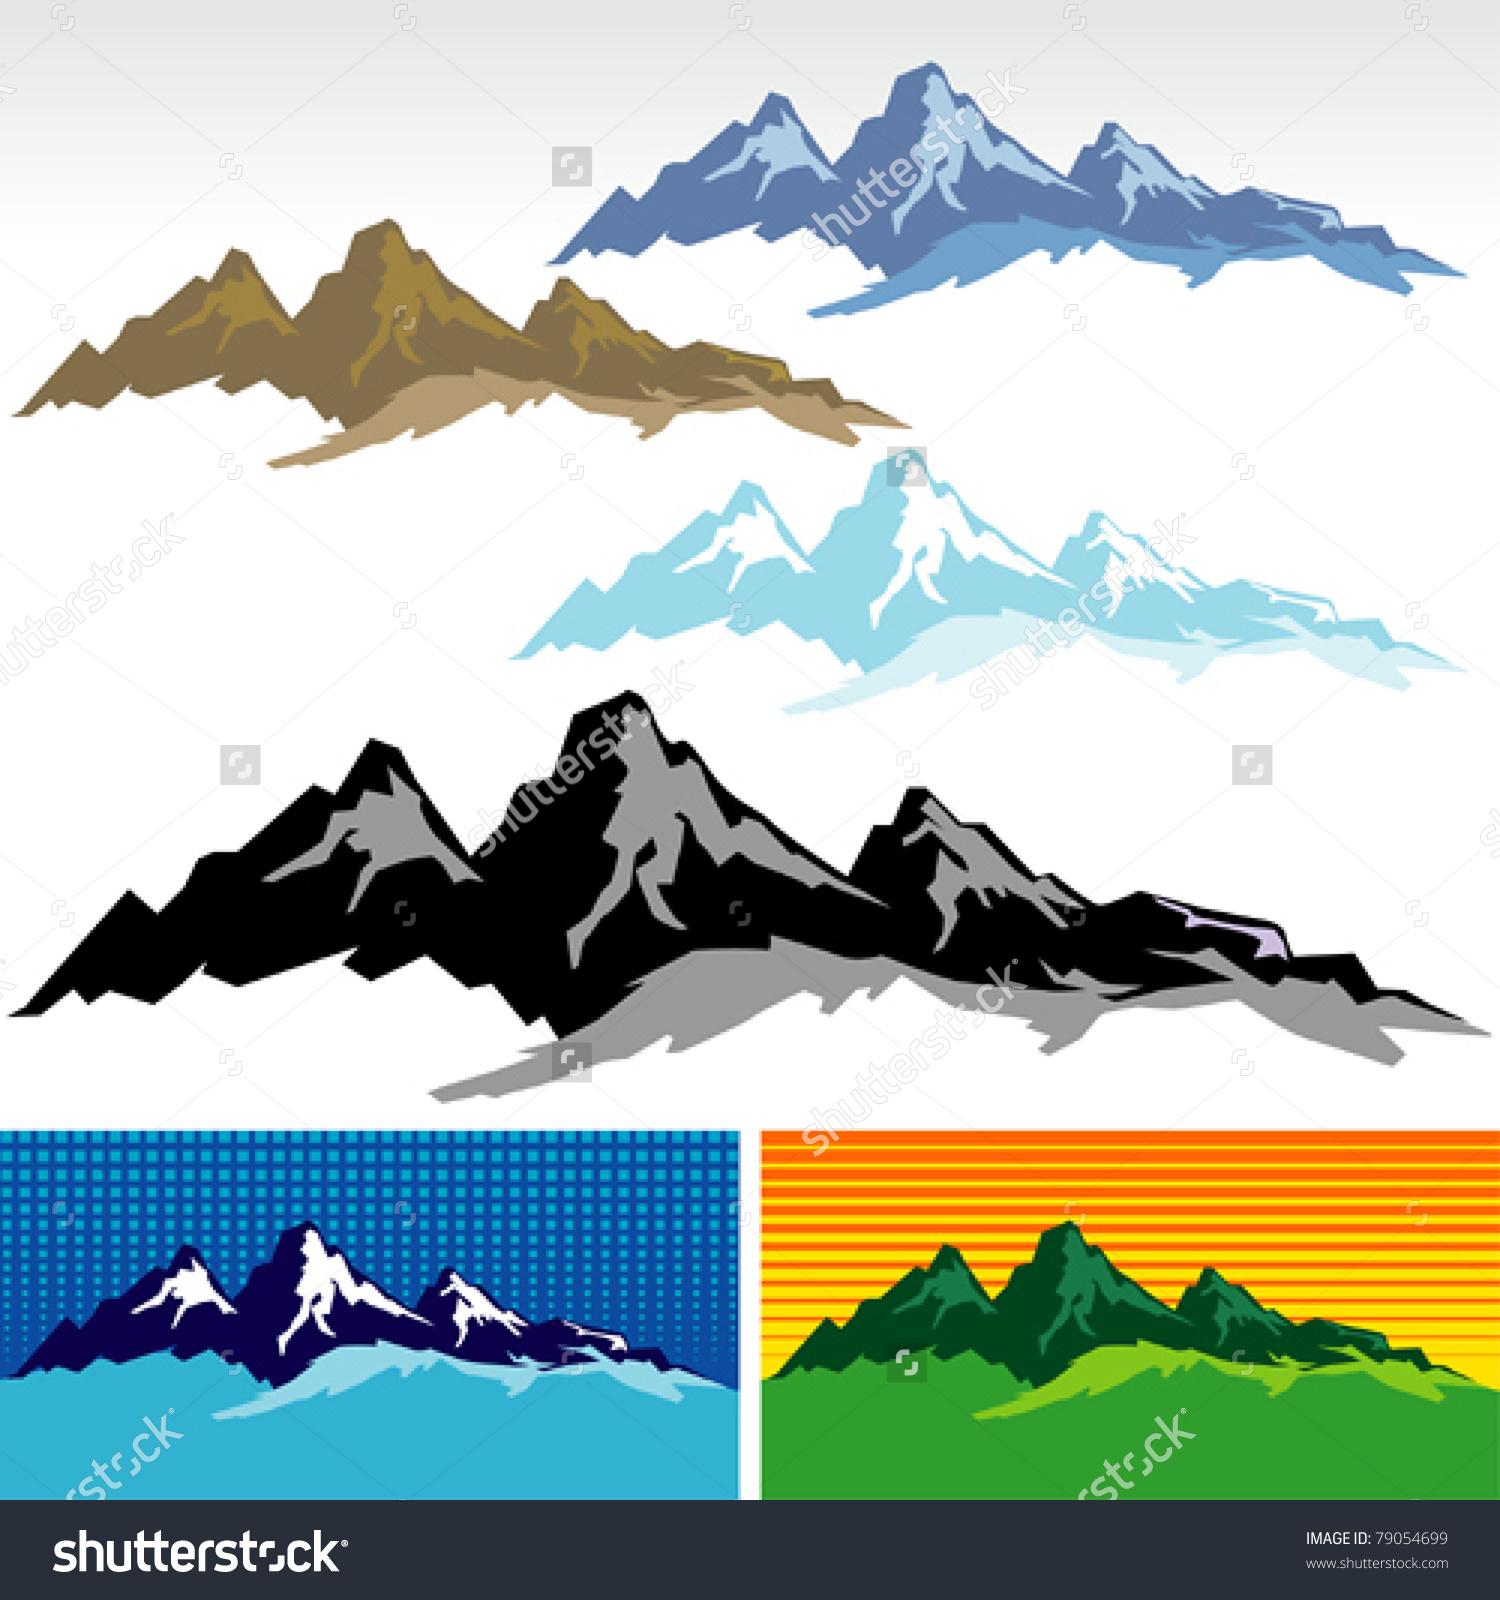 New Amazing Mountain Hills Symbols Stock Vector 79054699.